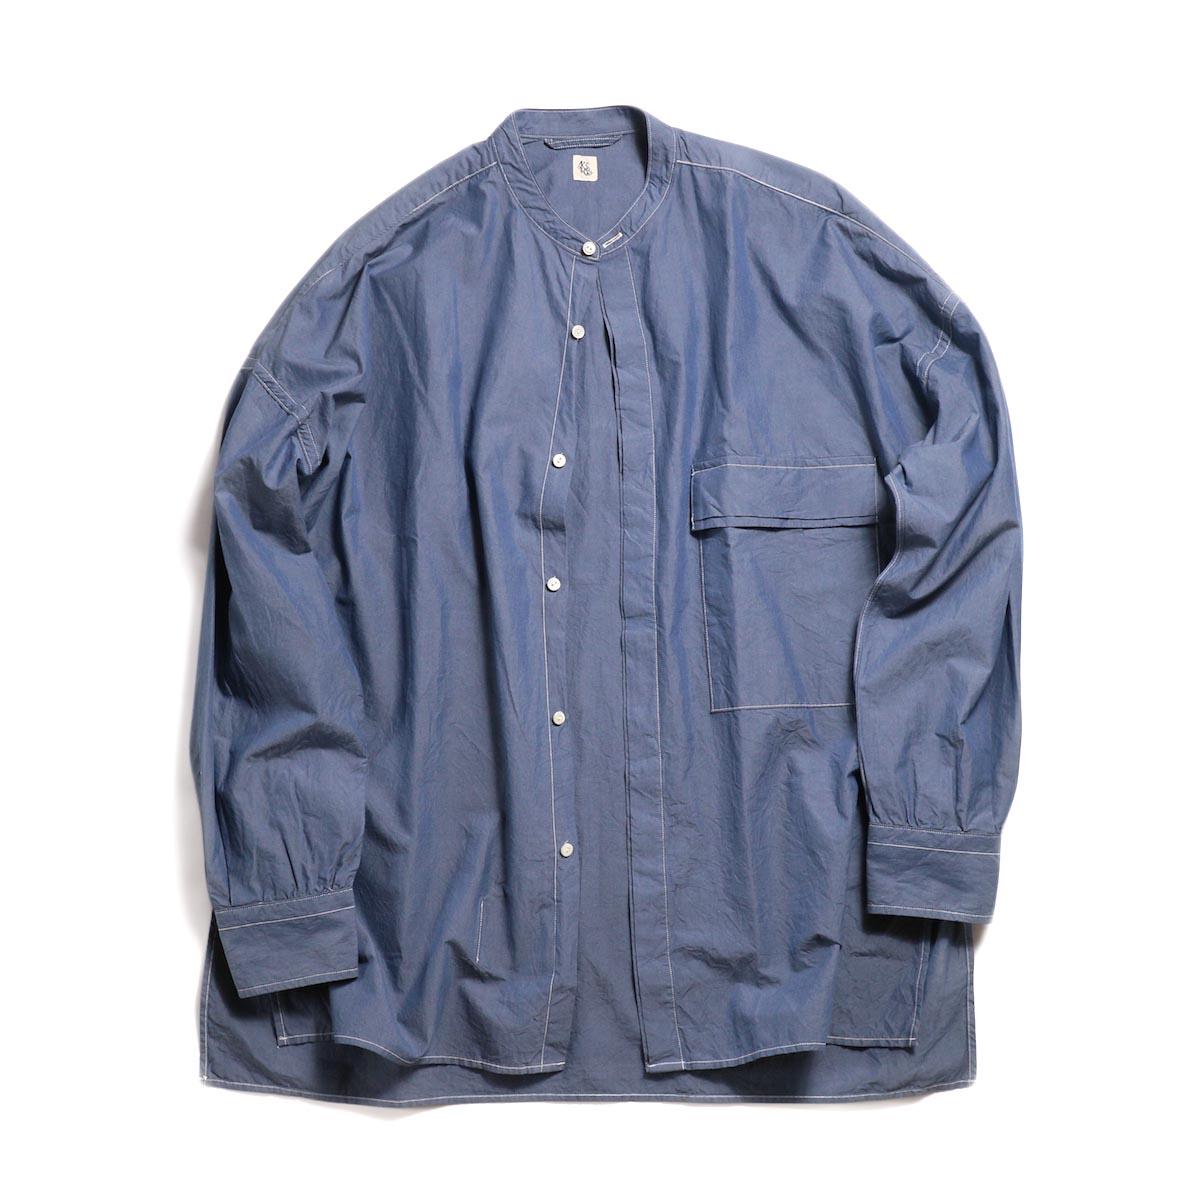 Kaptain Sunshine / Fly Front Band Collar Shirt -Blue Gray